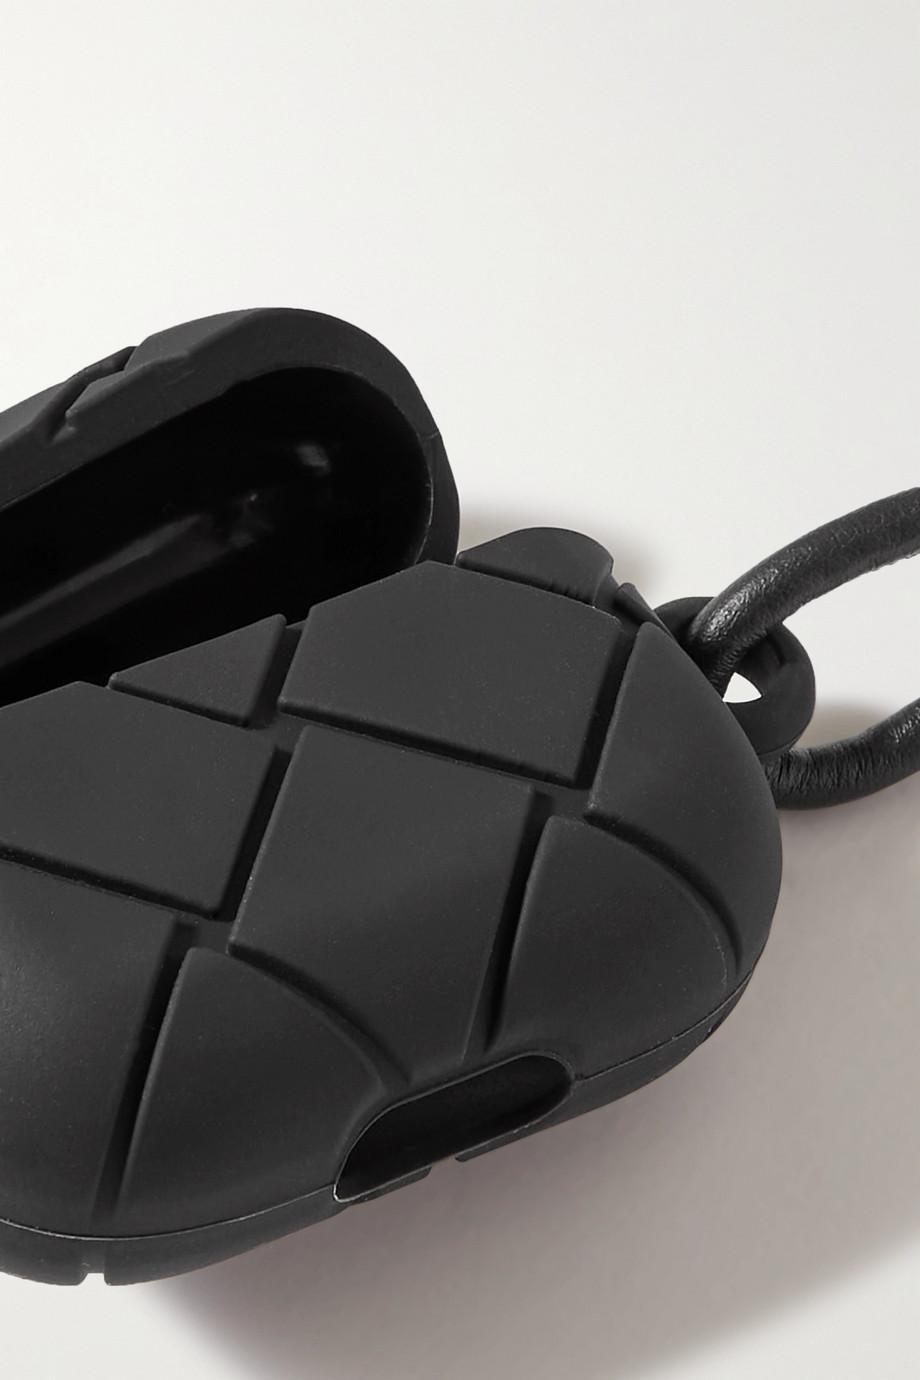 Bottega Veneta Intrecciato rubber AirPods case